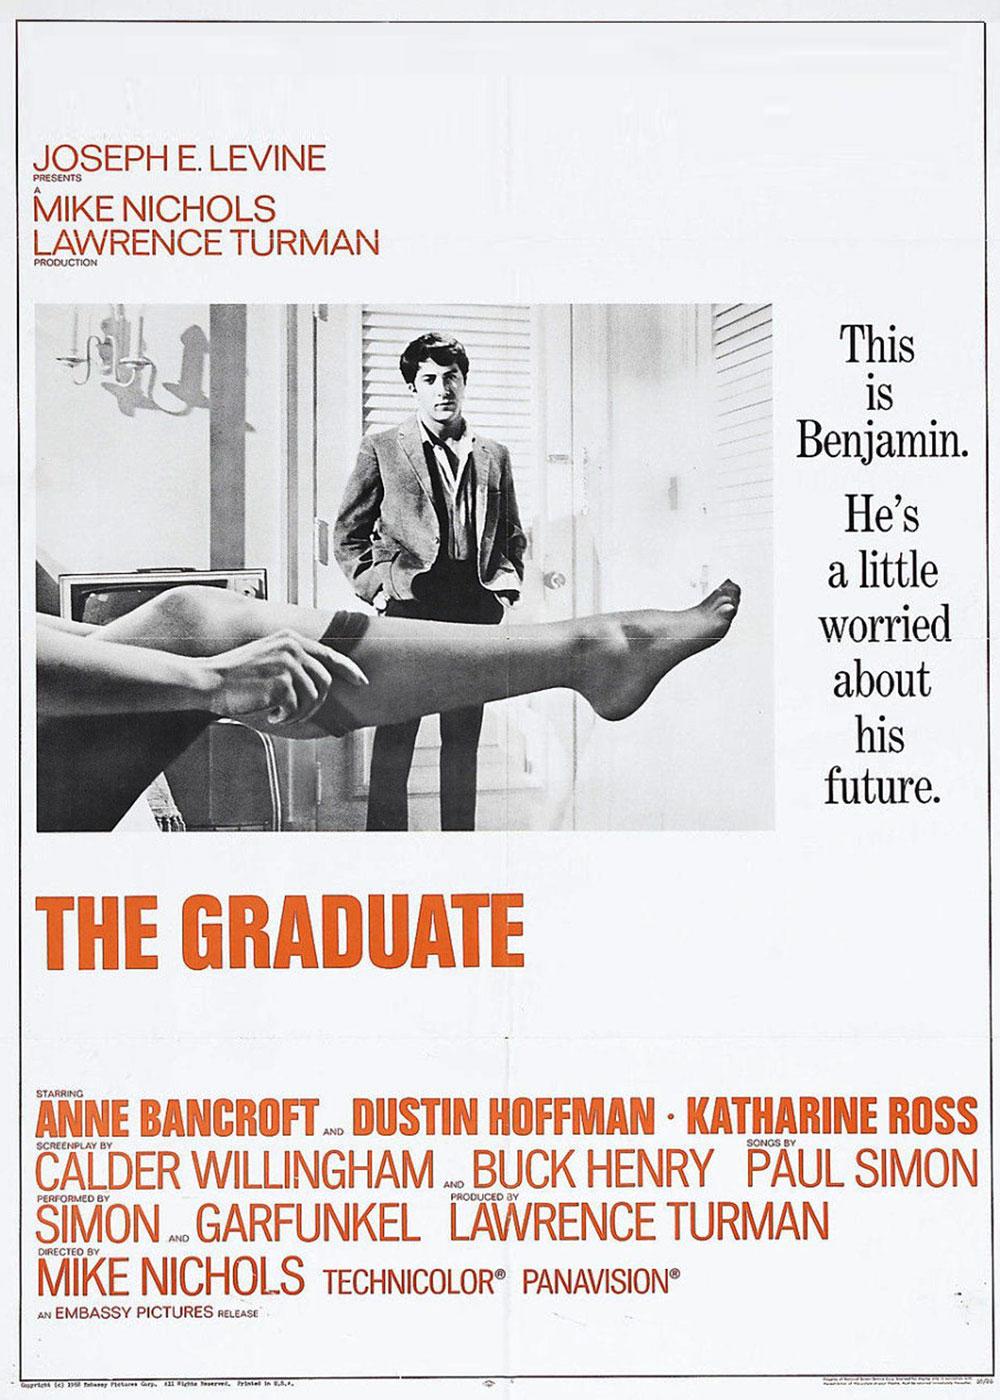 Película - The Graduate - Mike Nichols (1967)